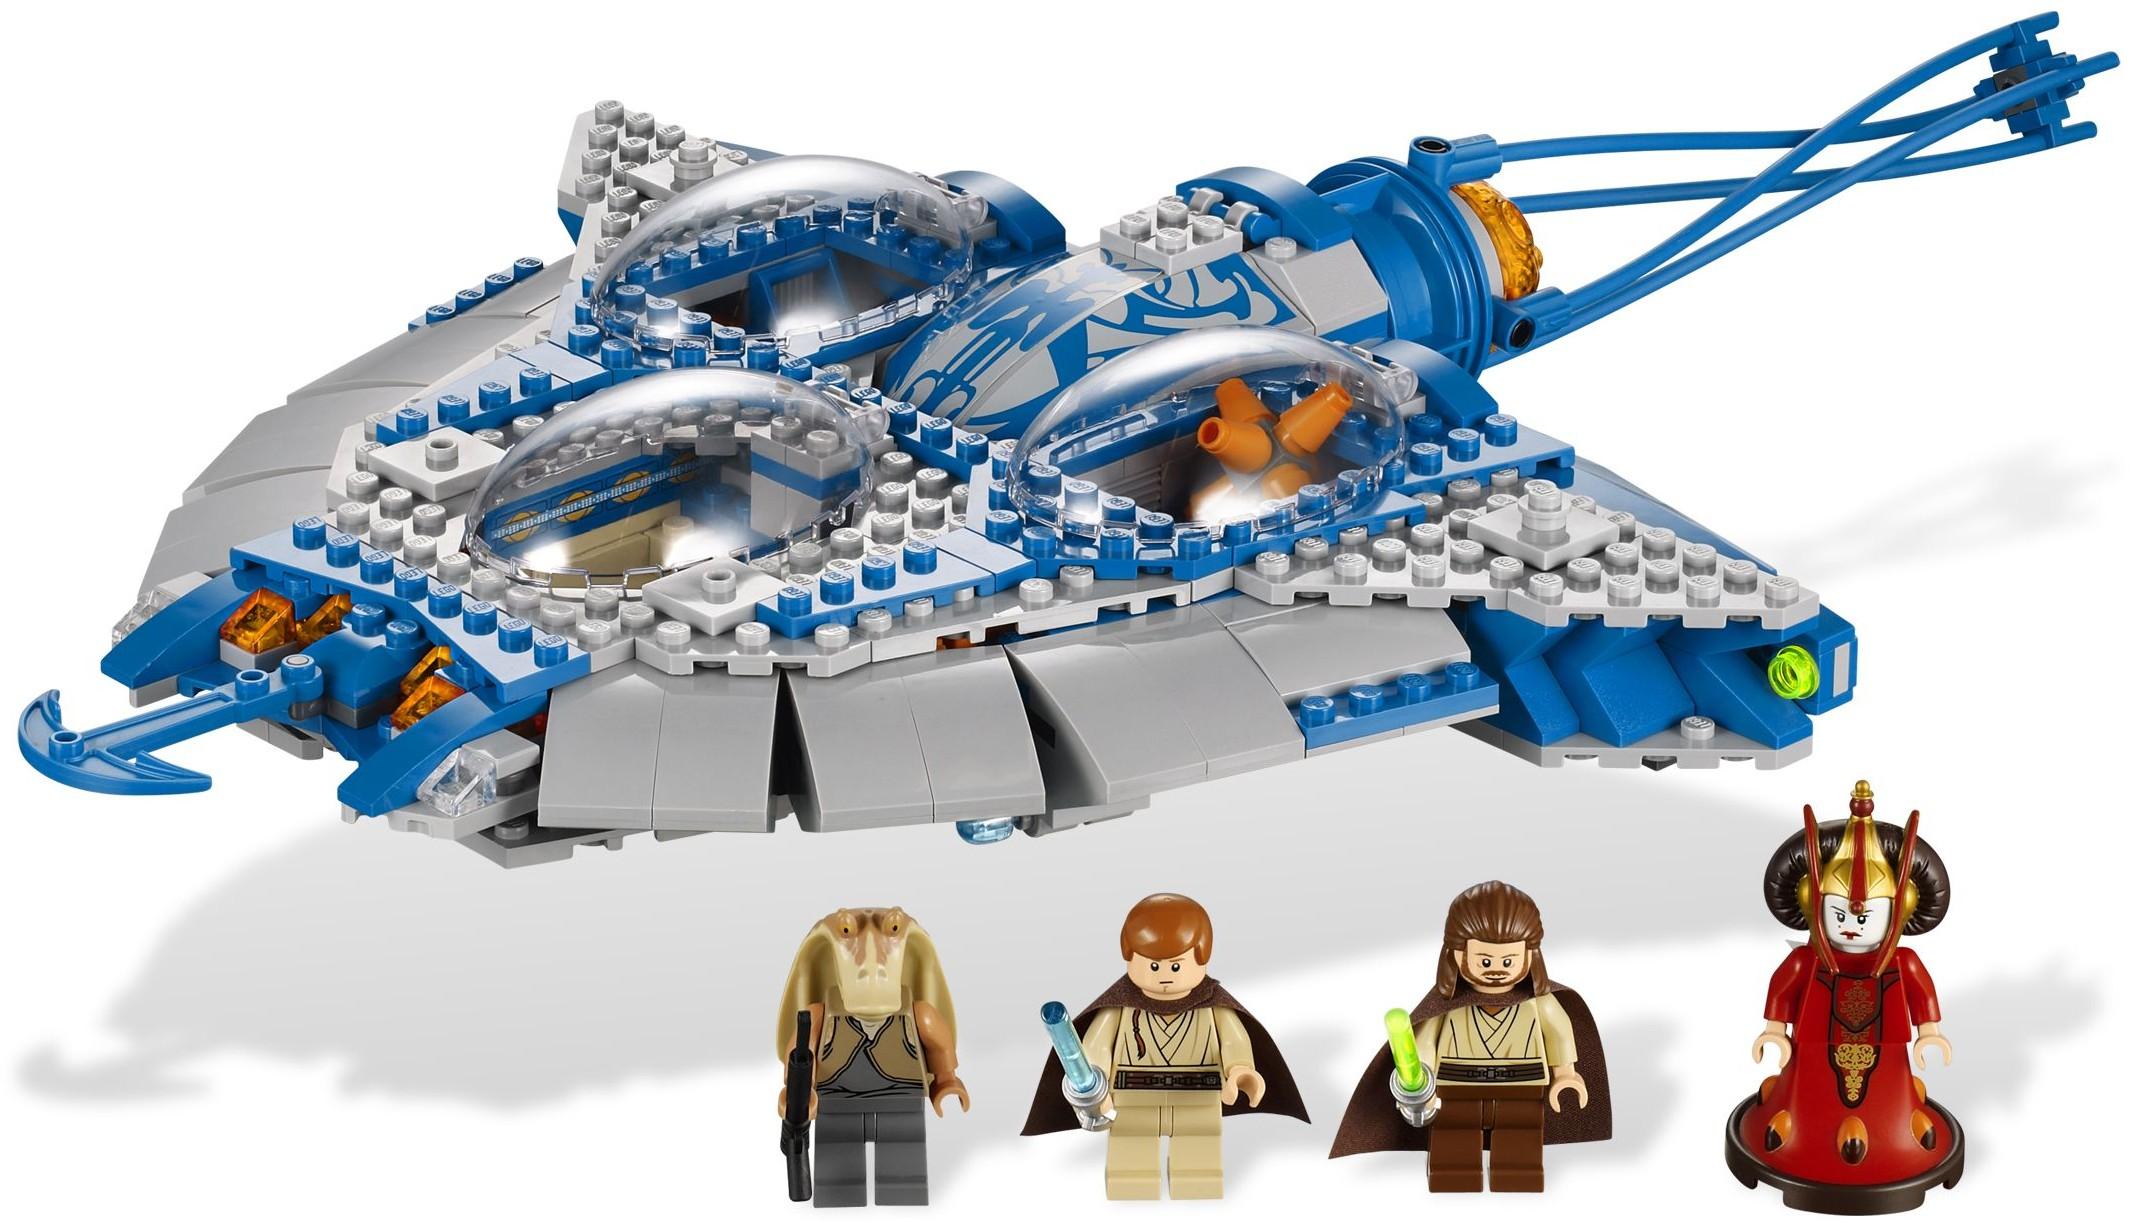 Gungan Sub Queen Amidala 9499 On Lego Bricks Construction